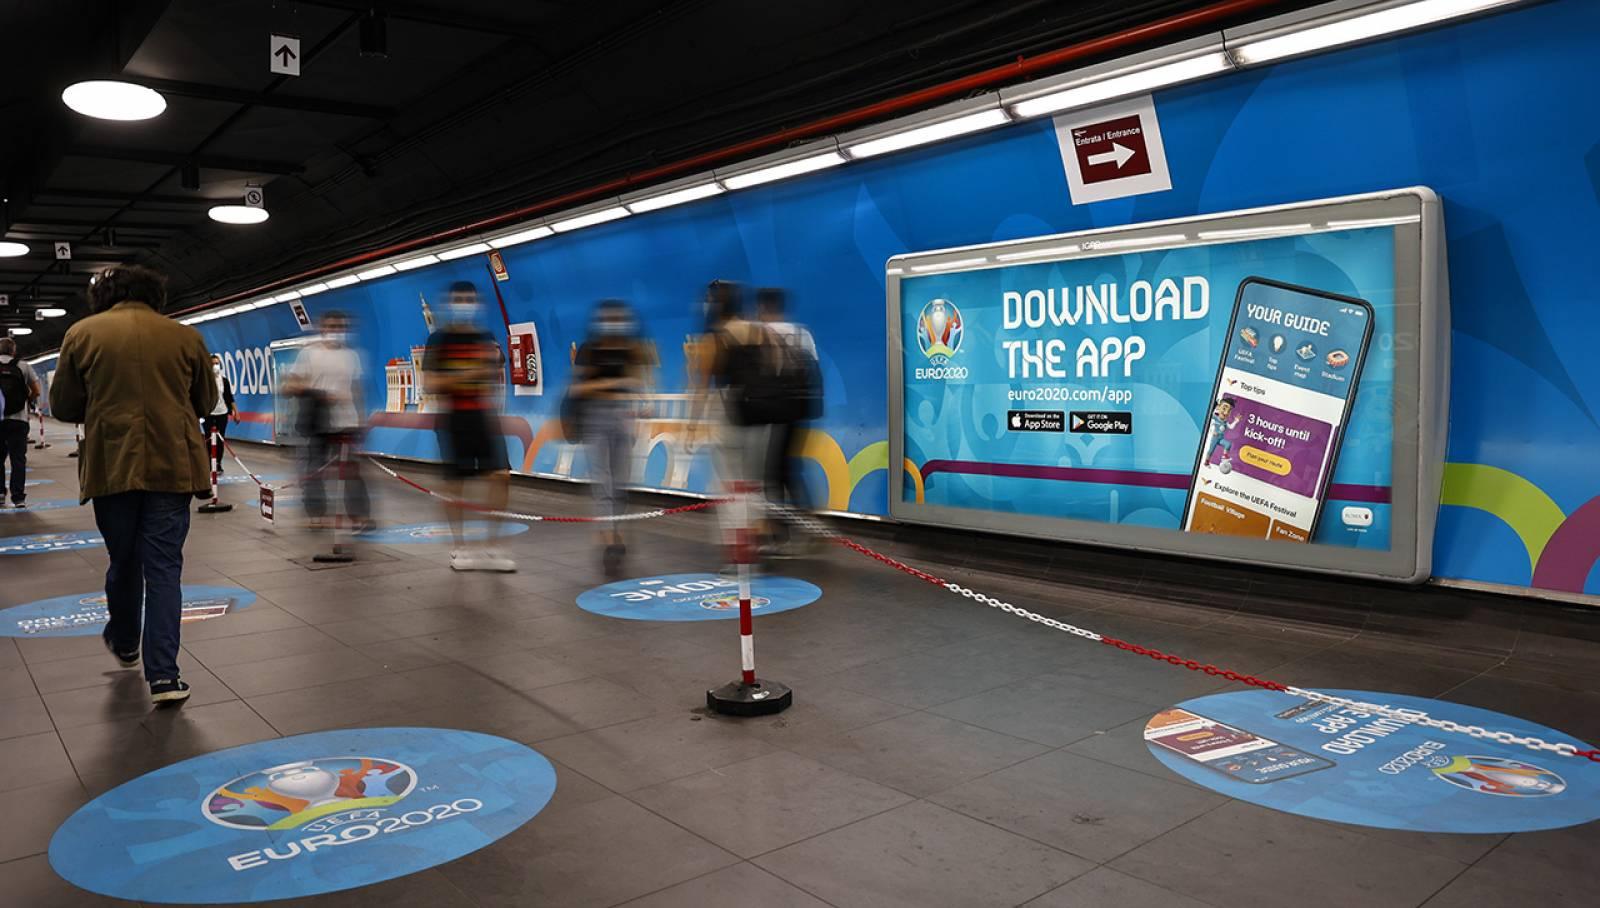 Pubblicità in metropolitana a Roma Spagna Station Domination IGPDecaux per UEFA 2020